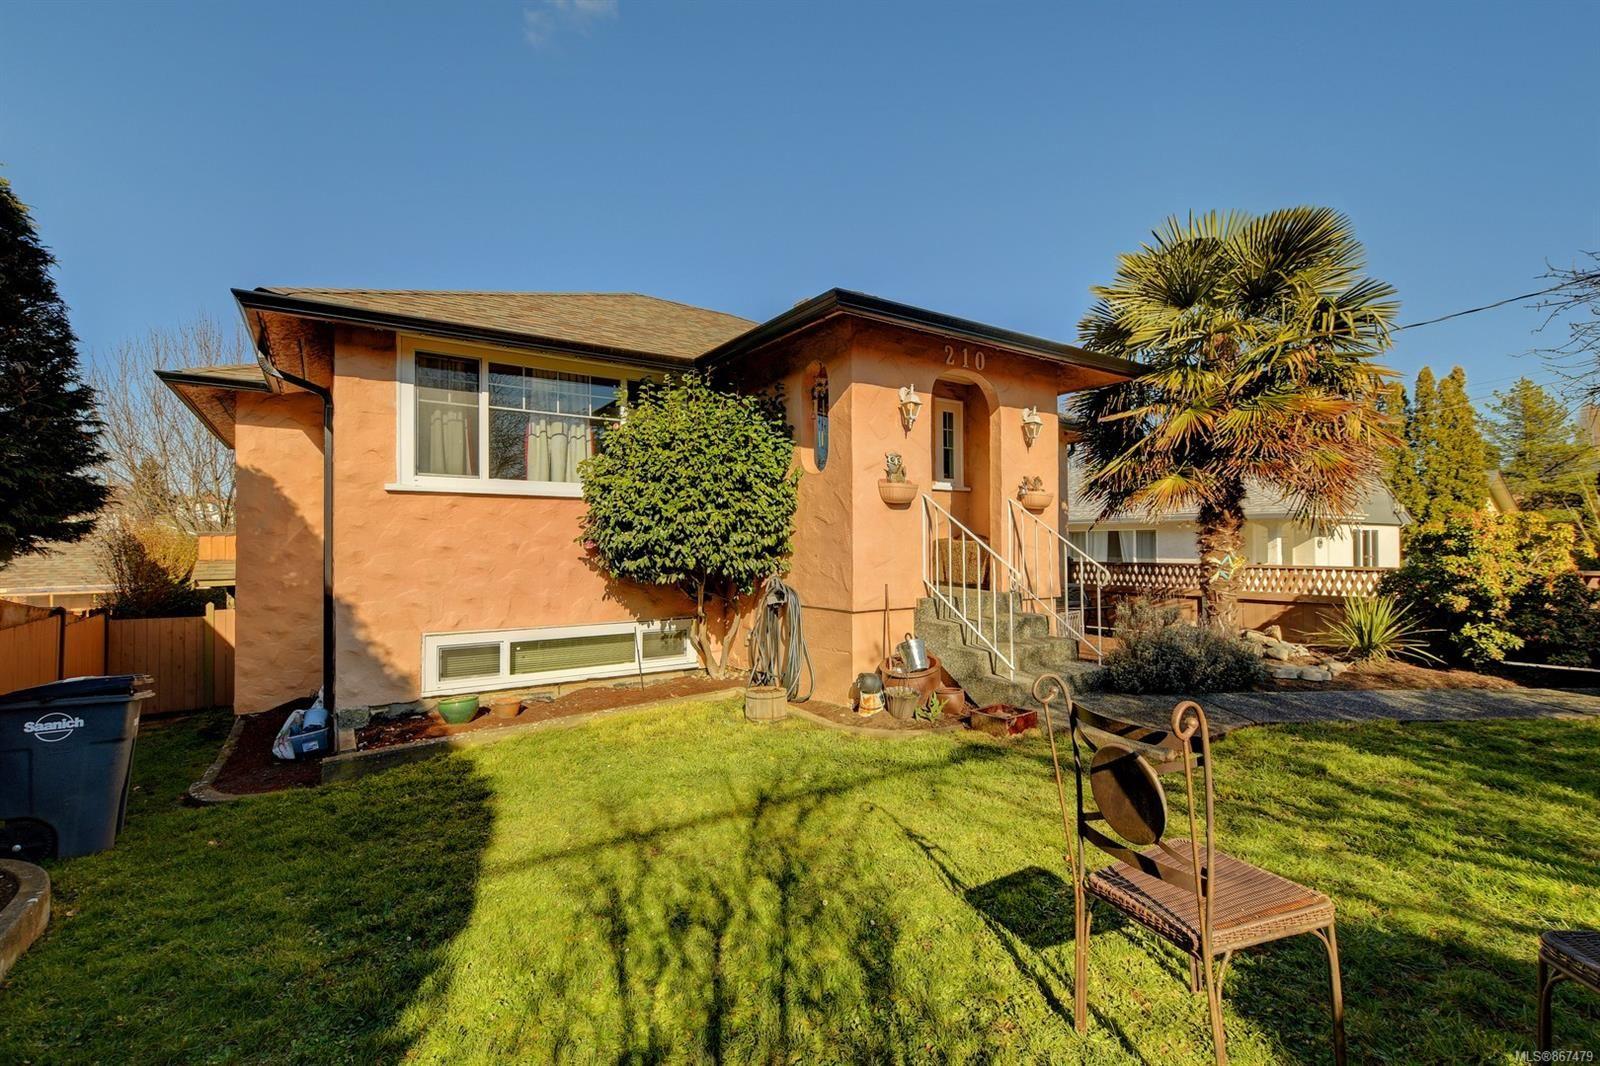 Main Photo: 210 Regina Ave in : SW Tillicum House for sale (Saanich West)  : MLS®# 867479